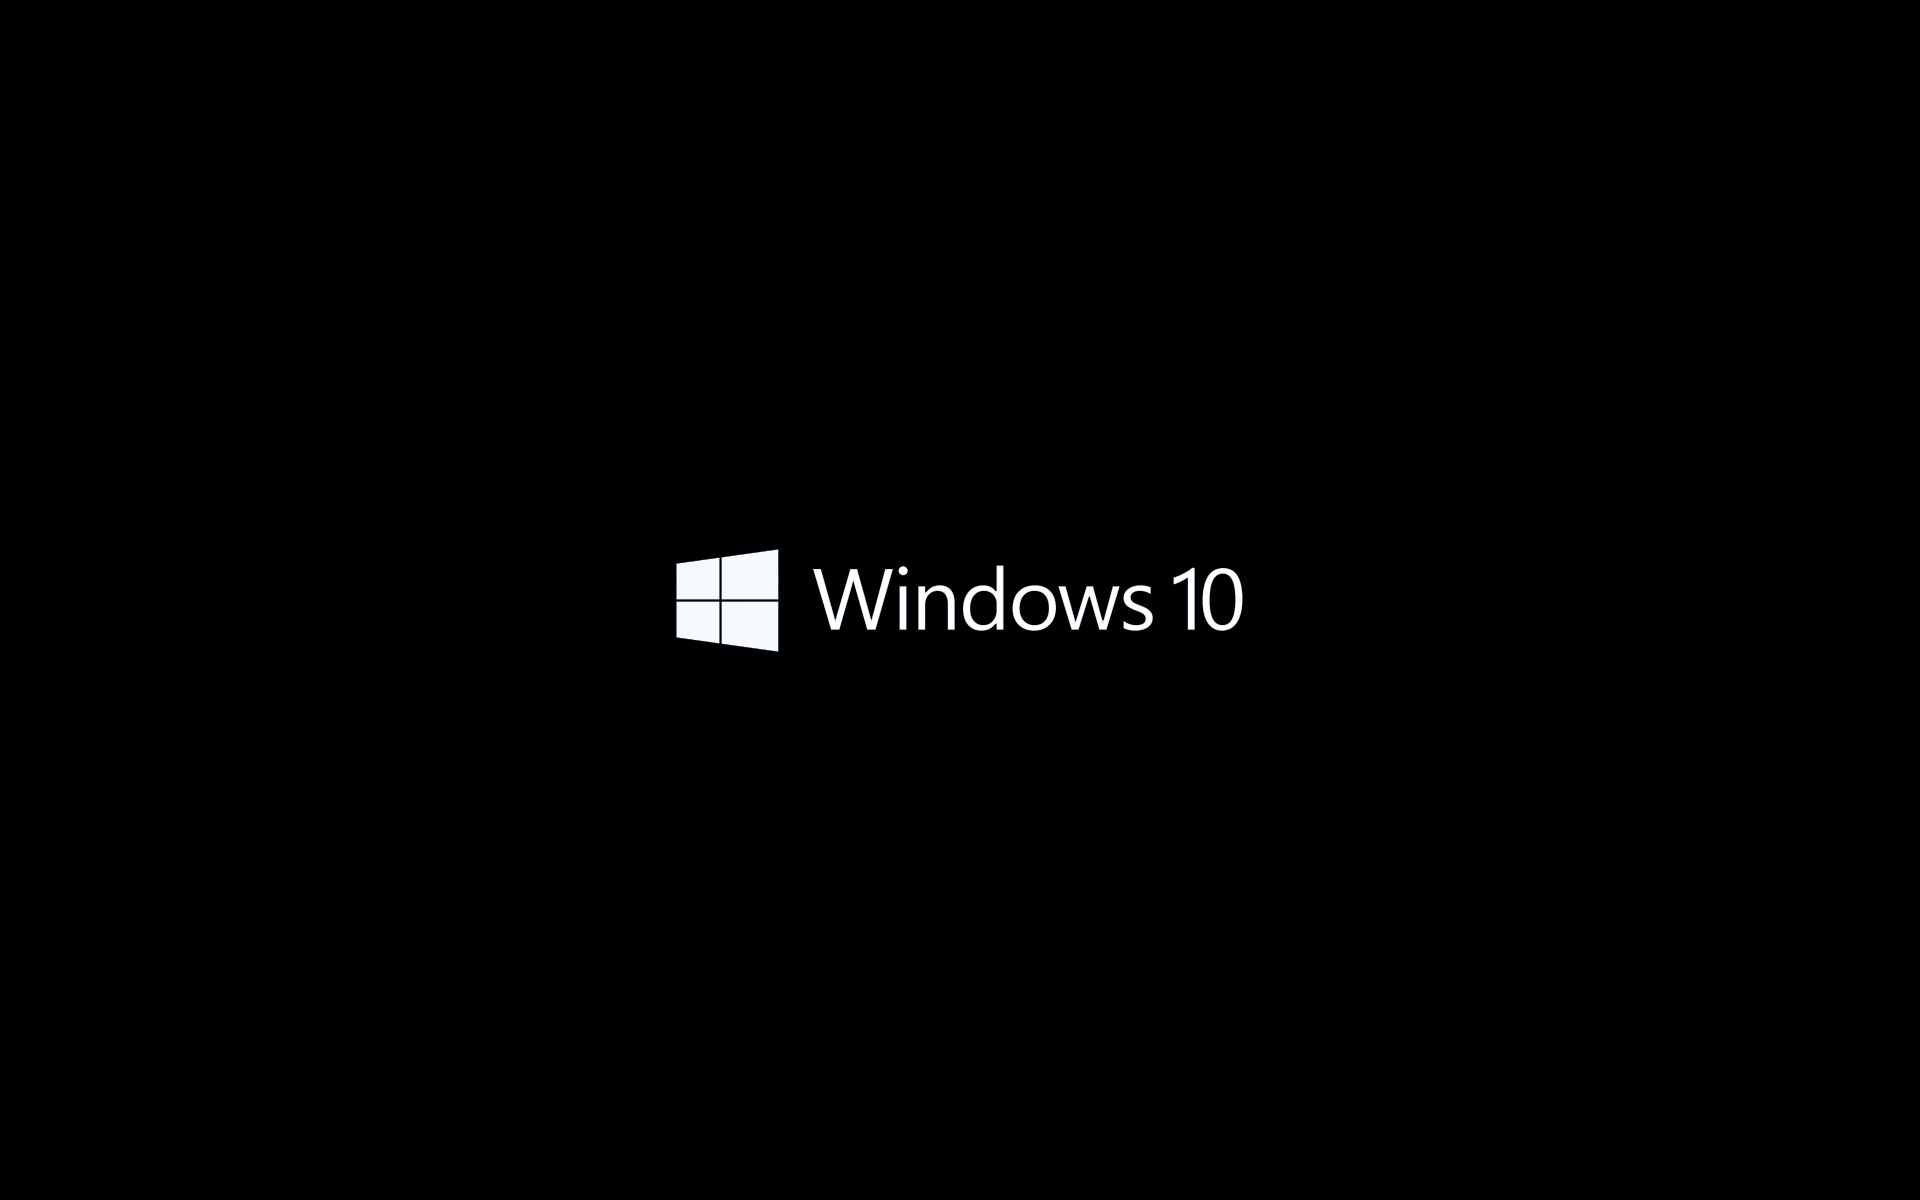 Windows-10-HD-Wallpaper-Plain-3